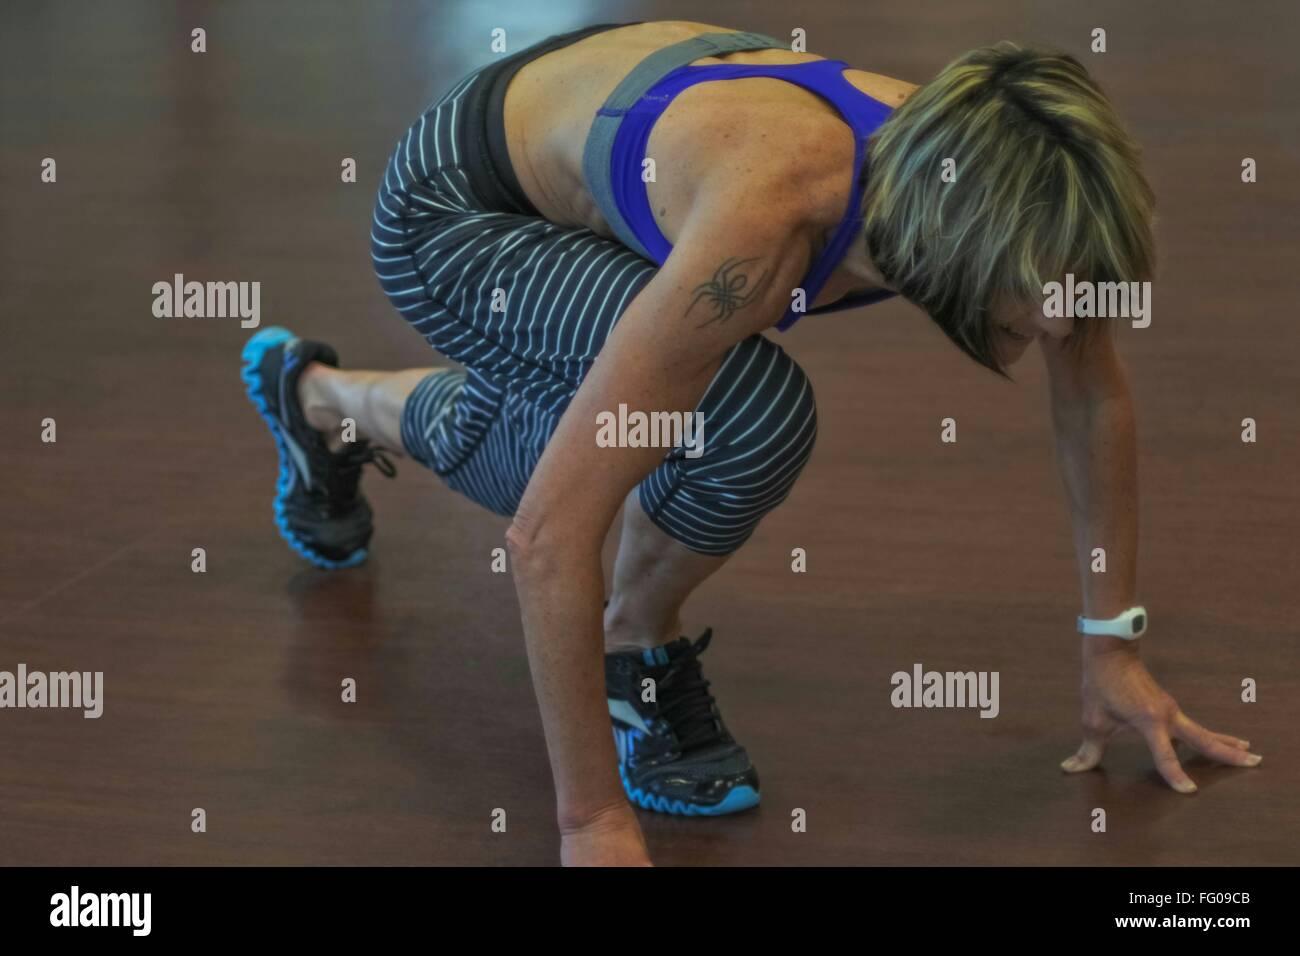 Athletic Female Sprinter On Starting Blocks - Stock Image